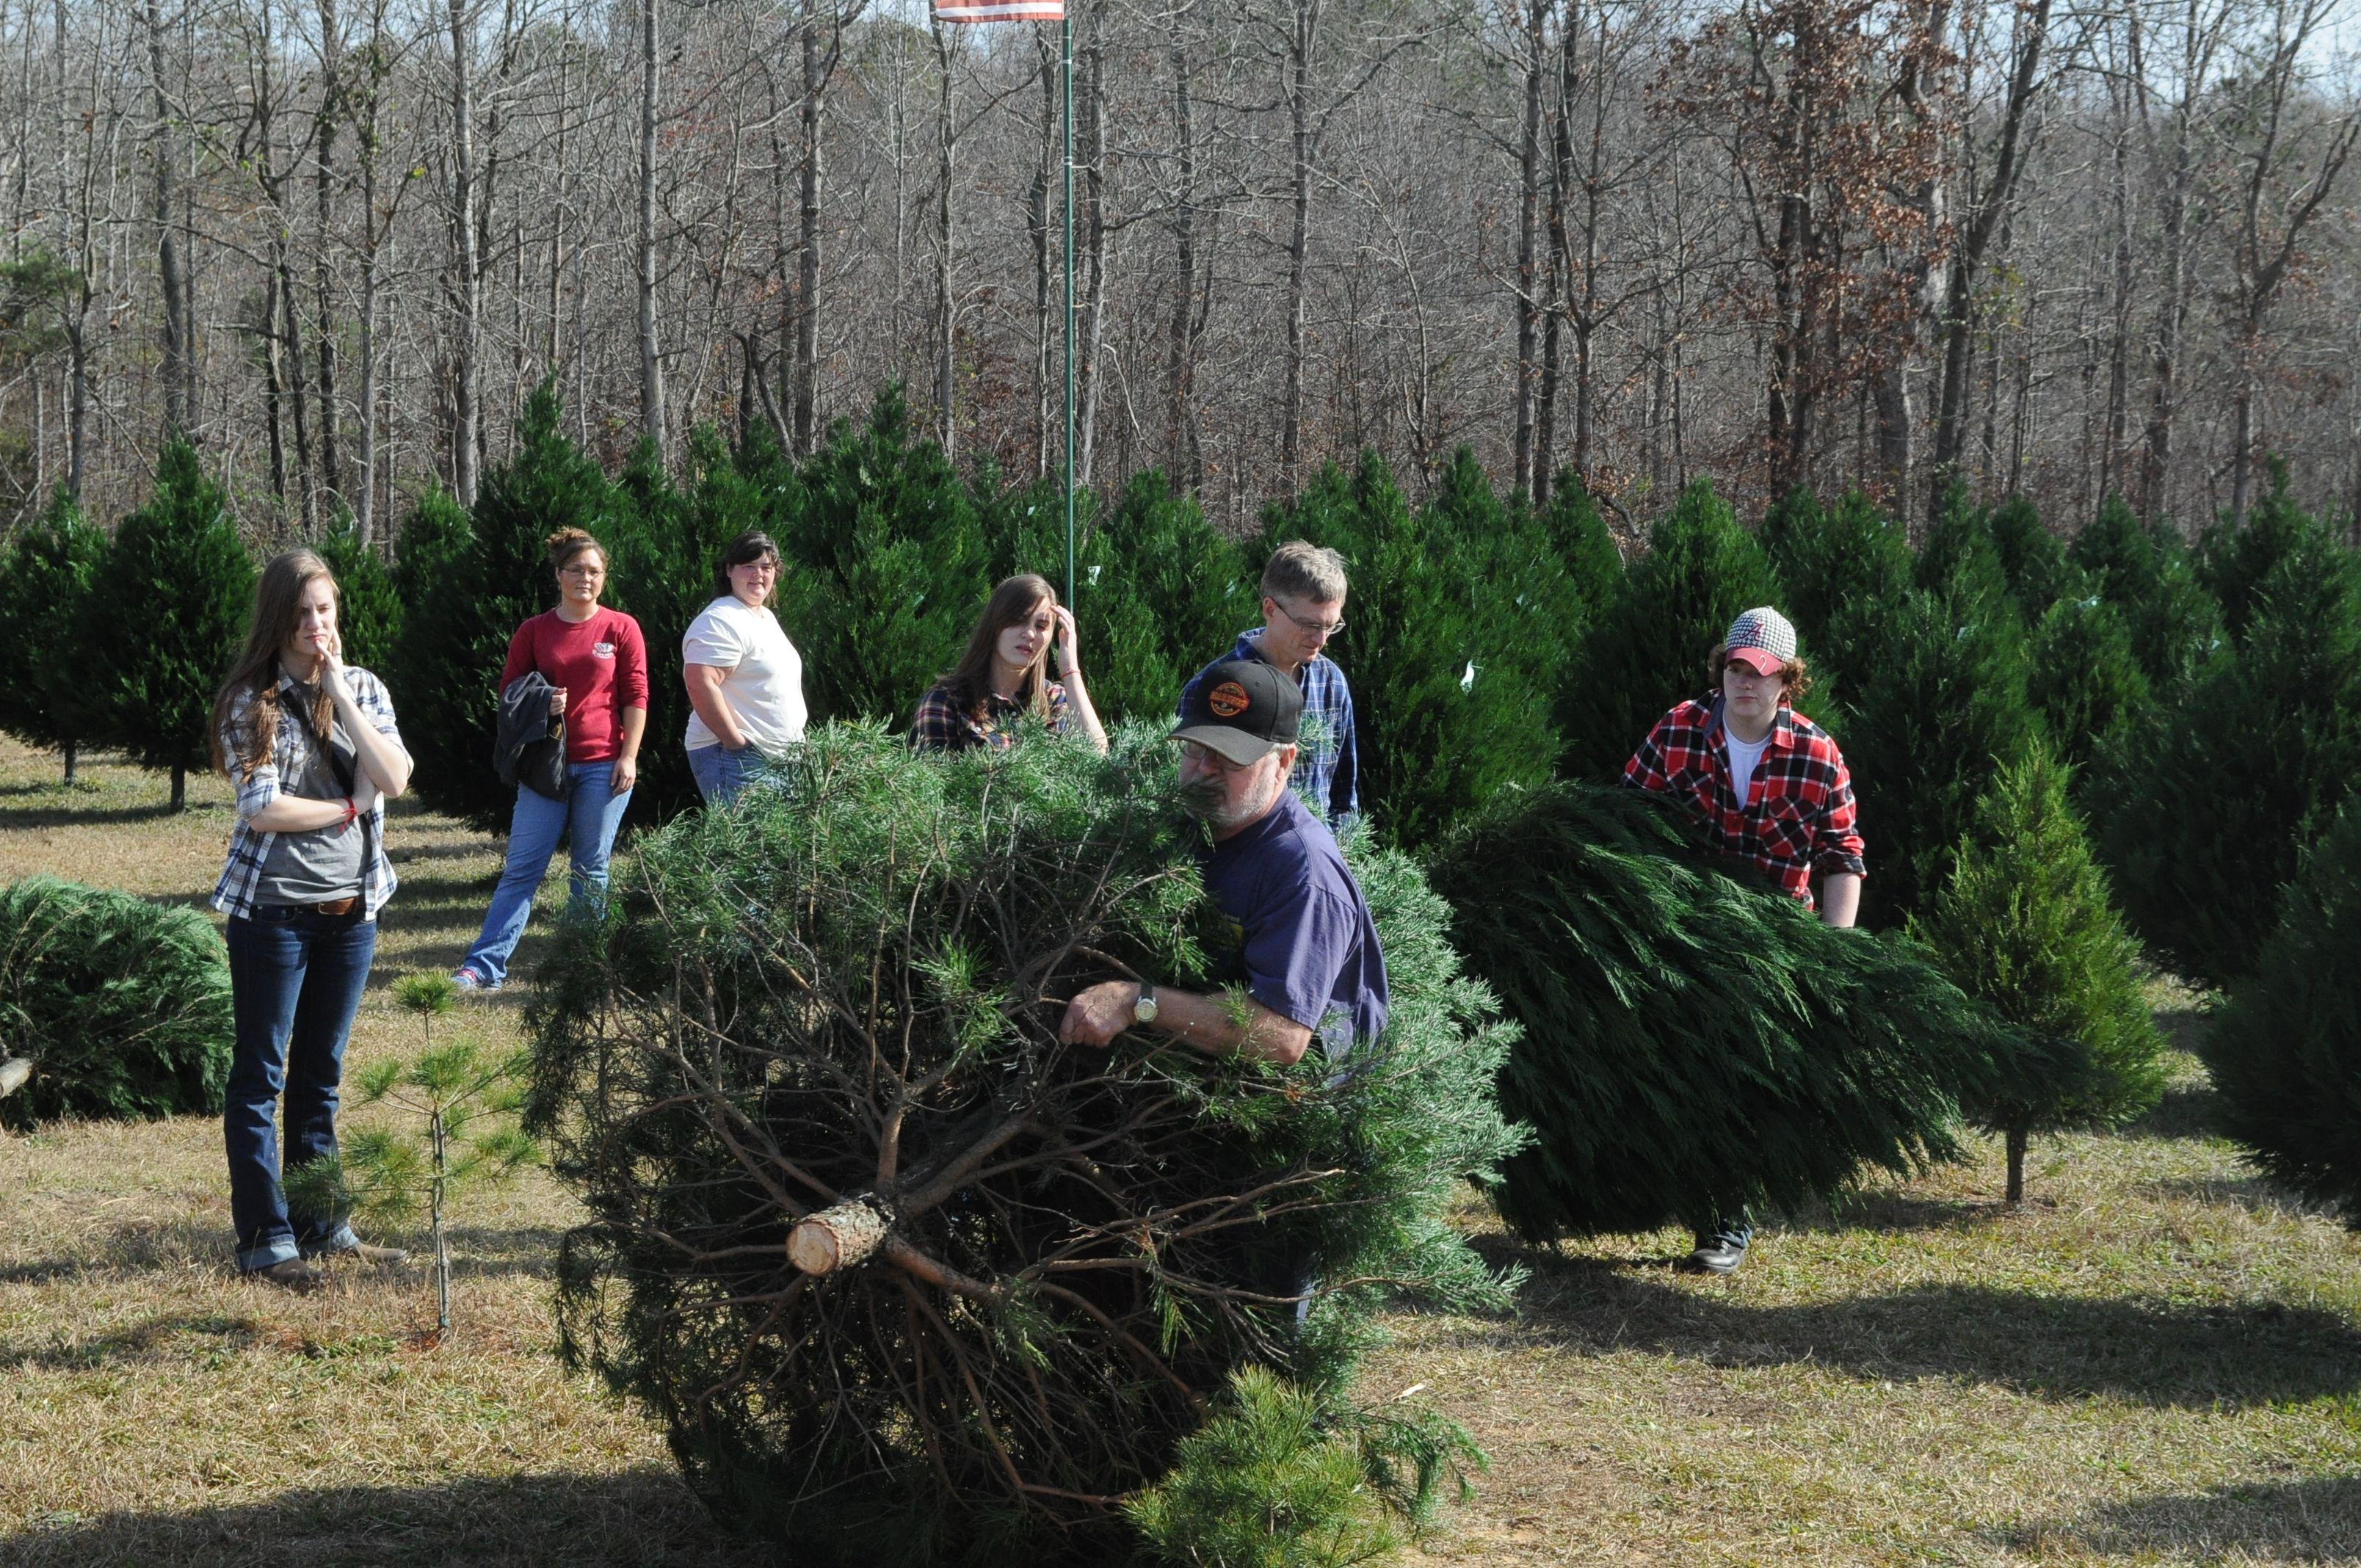 Christmas Tree Farm In Alabama Alabama Christmas Christmas Tree Farm Tree Farms